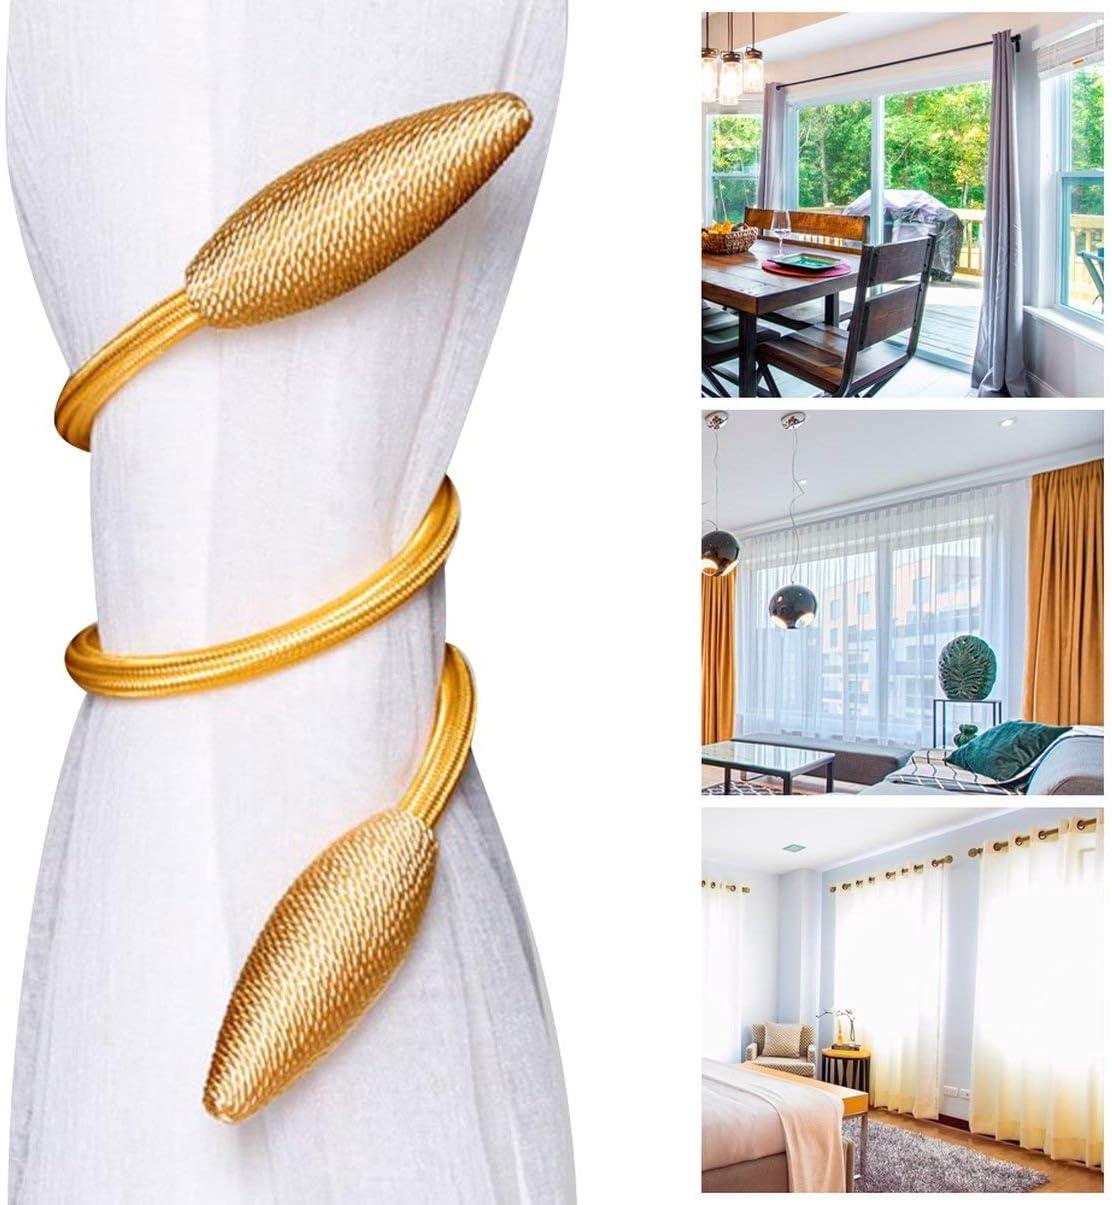 FHJZXDGHNXFGH Portable Curtain Tiebacks Universal Curtain Tie Rings Modern Curtain Rope Living Room Curtain Buckle